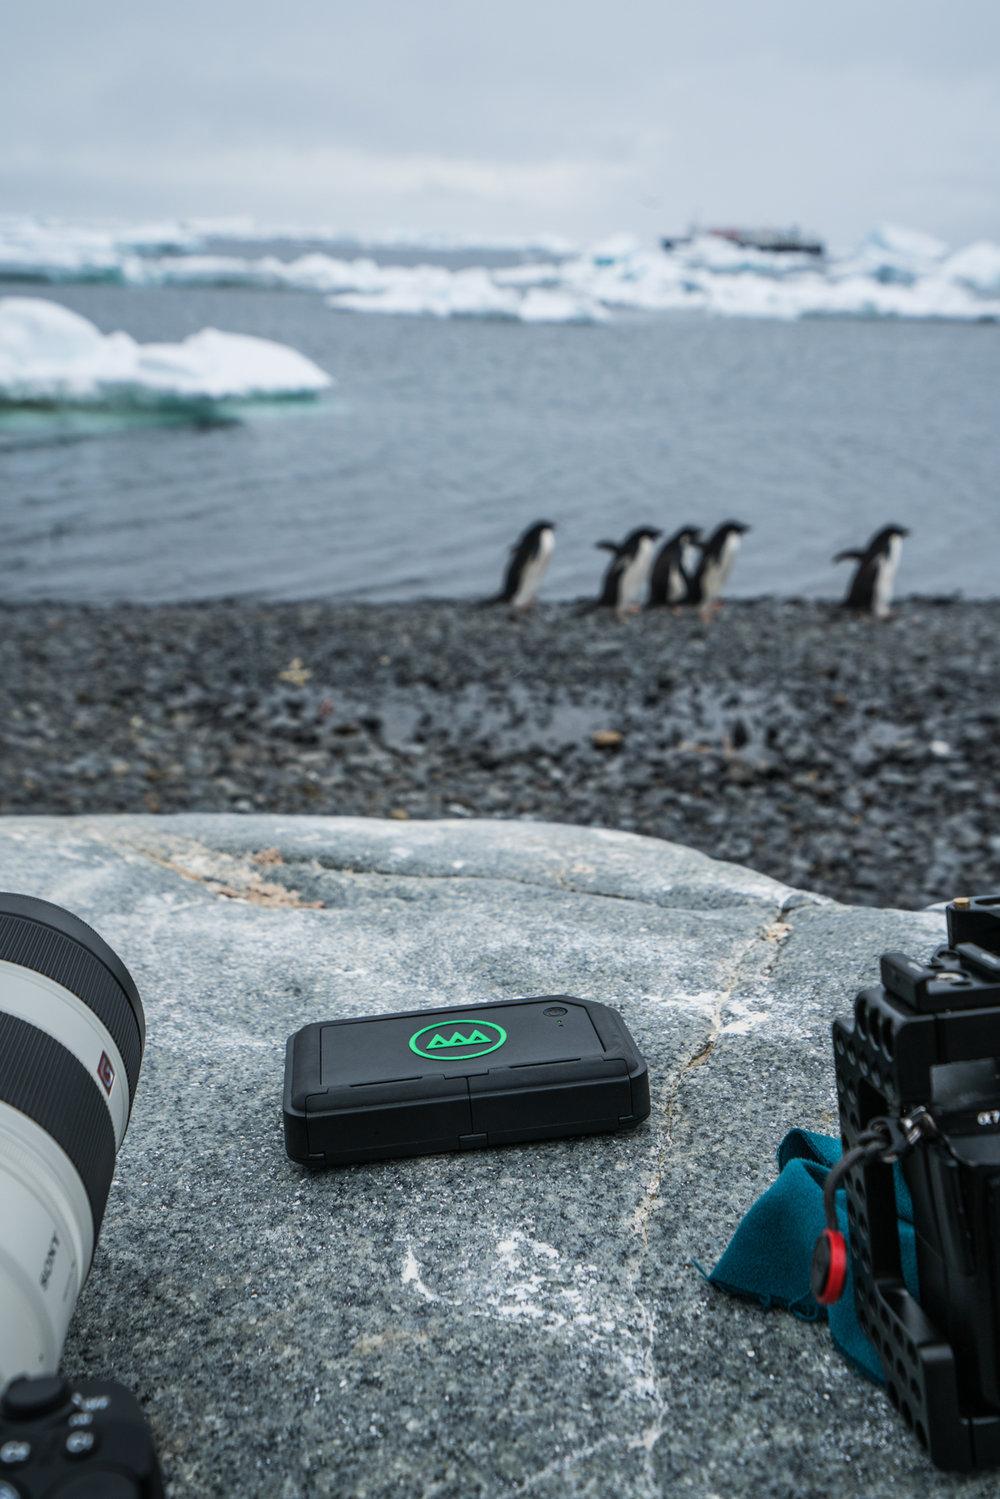 12-2017-Antarctica-a7r2-gnarbox-DSC04086.jpg